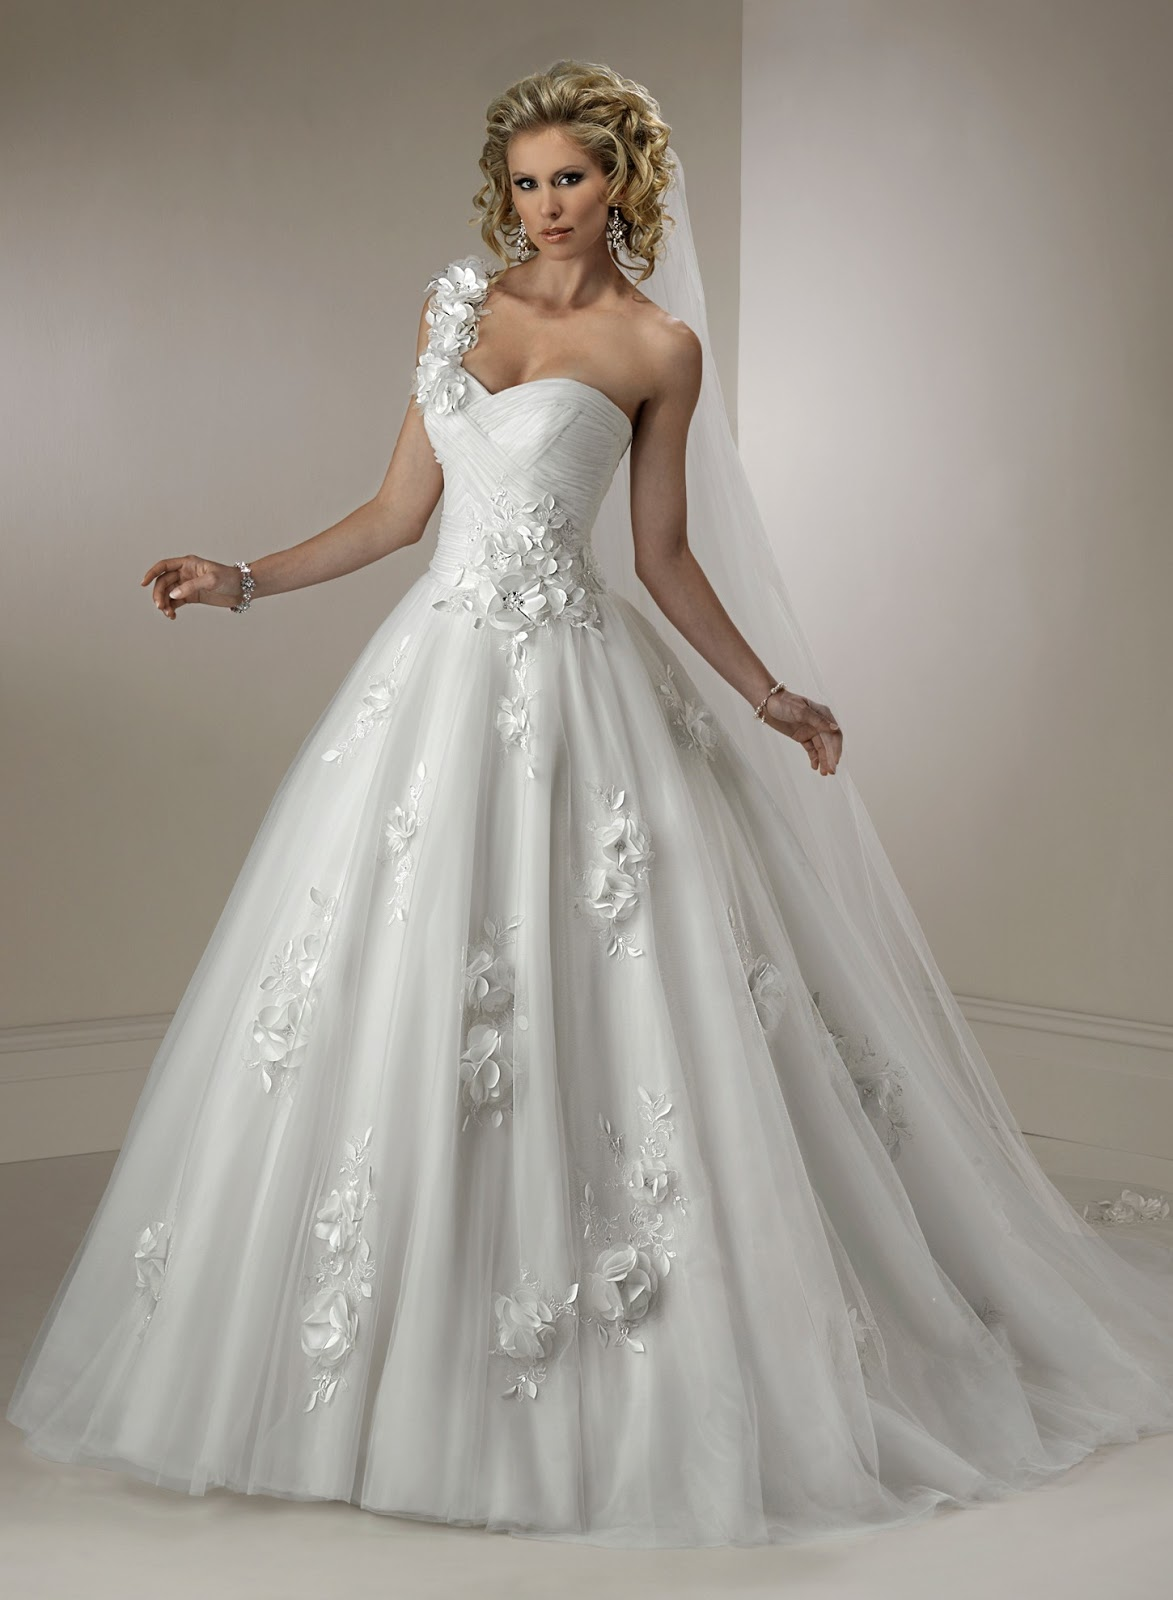 wedding dresses cold climates: Wedding Dresses Online